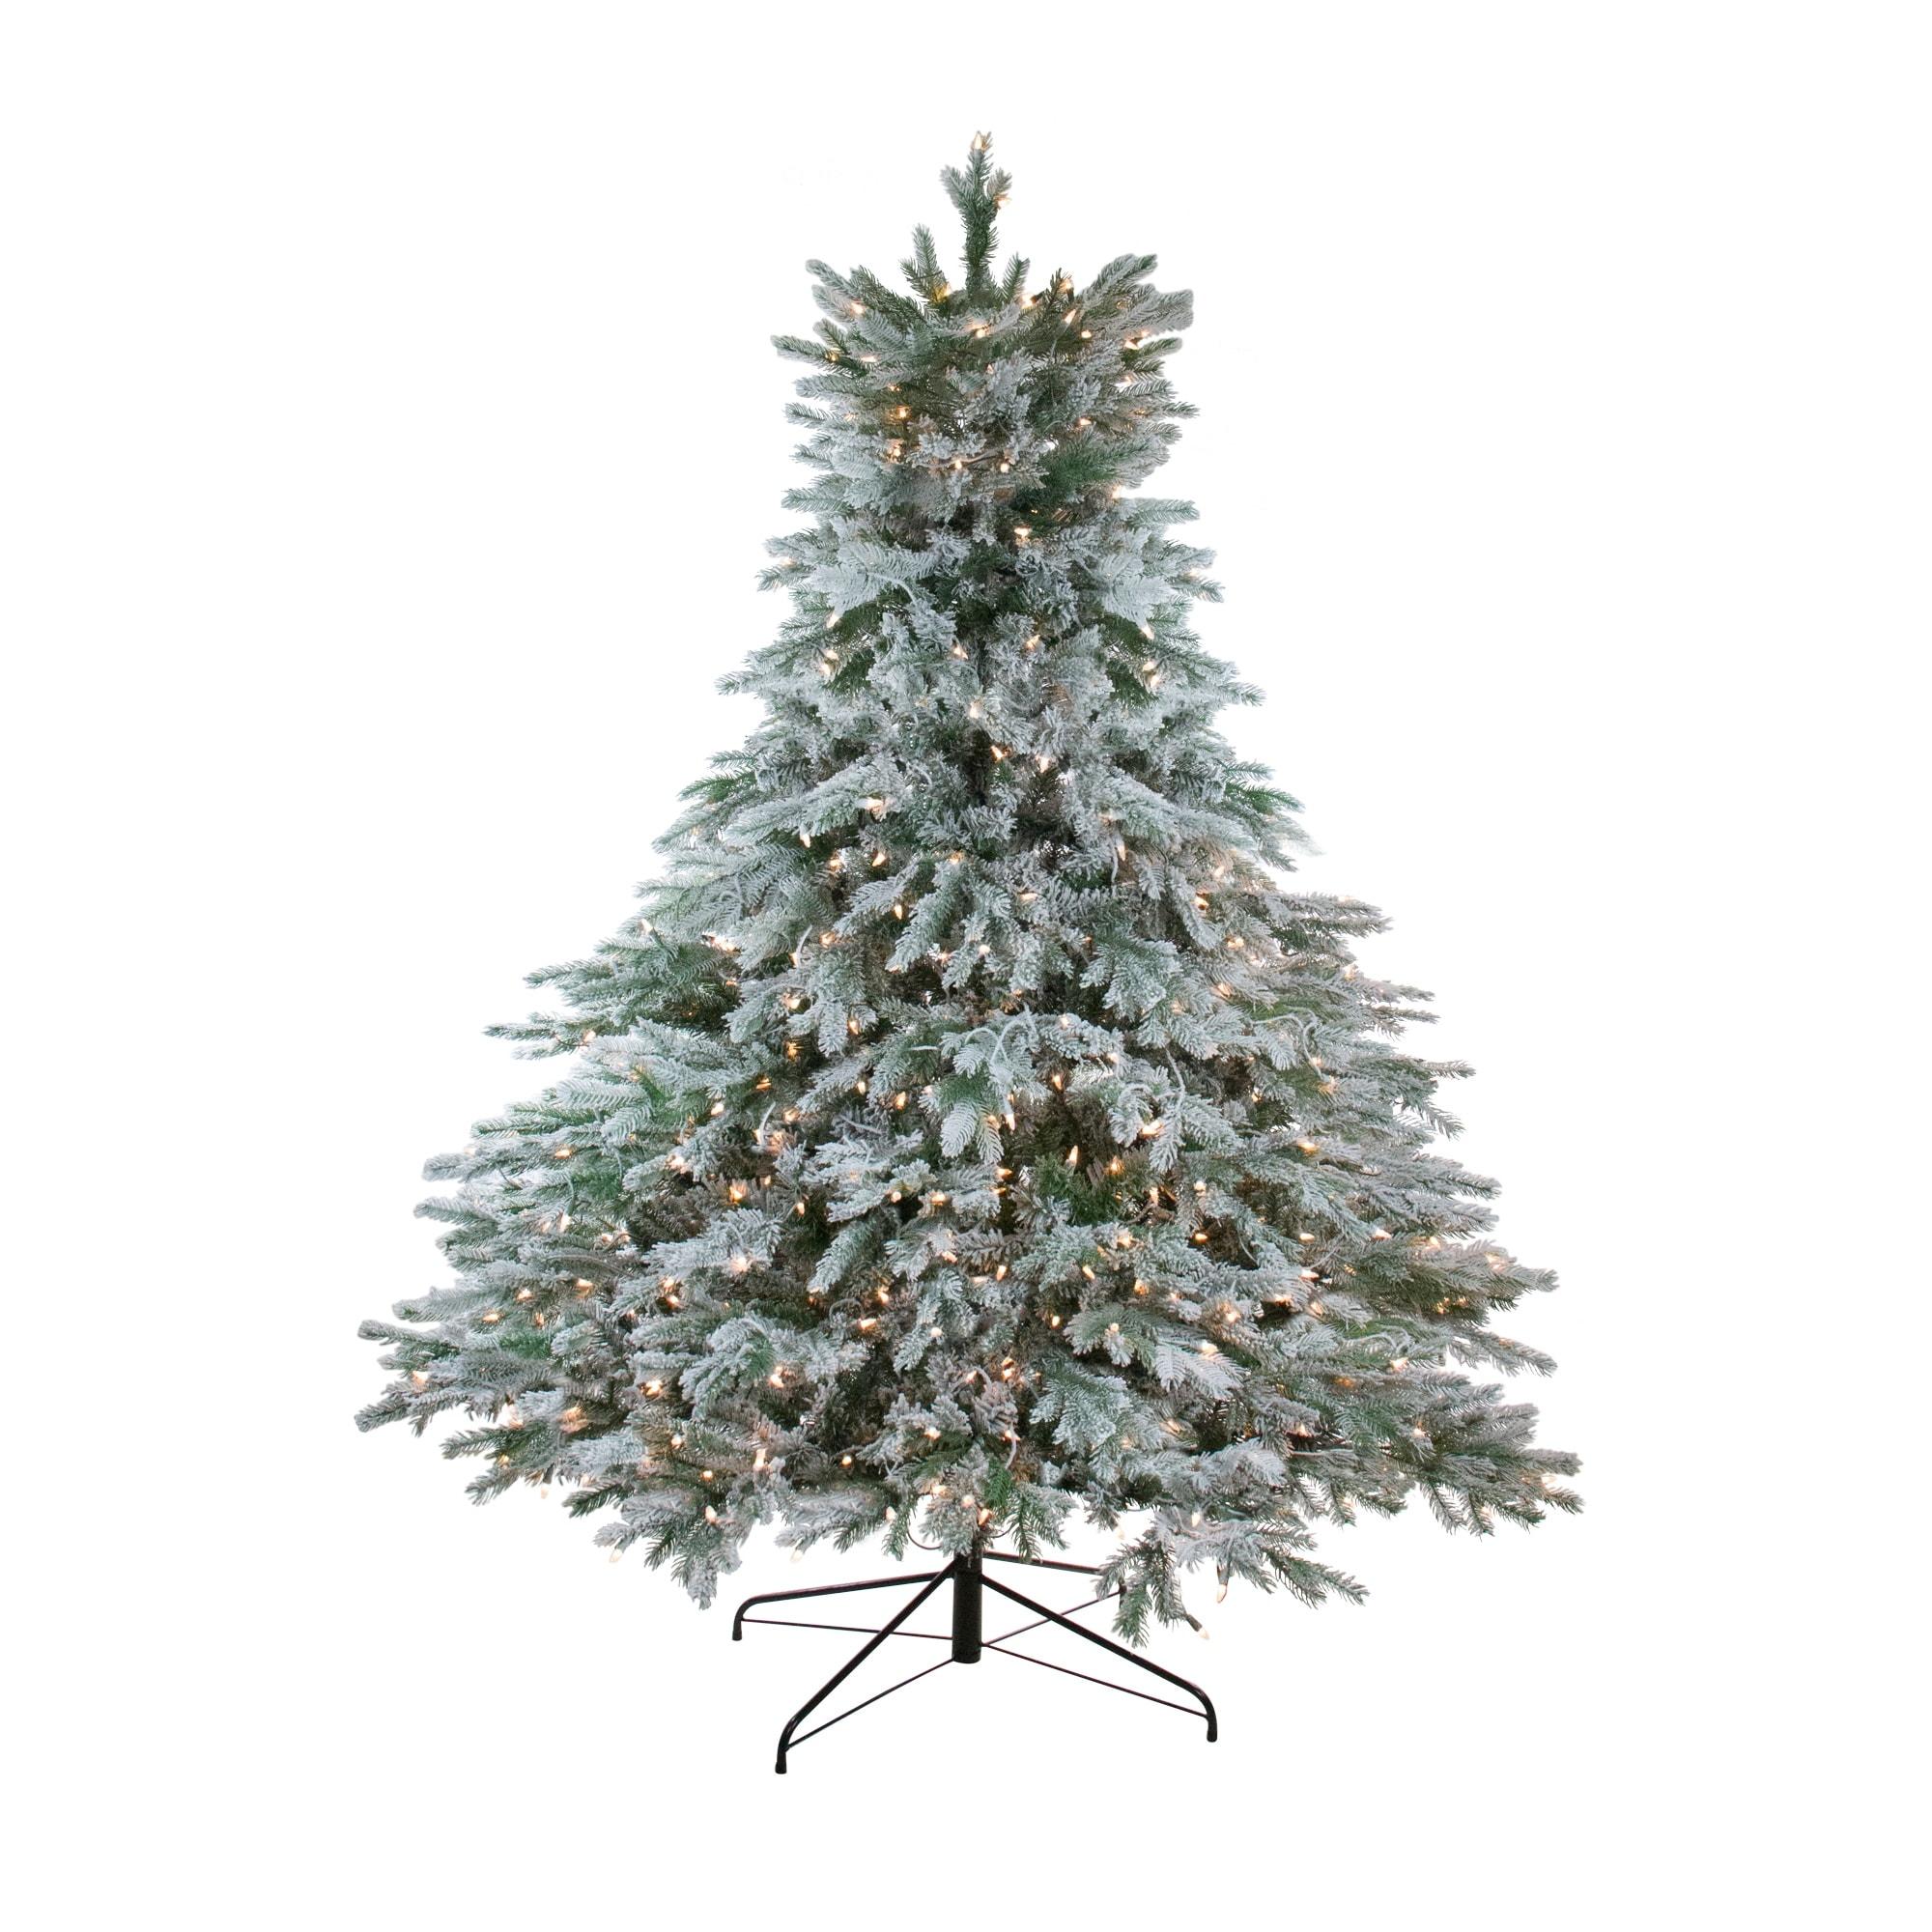 9 Artificial Christmas Tree.9 Pre Lit Green Flocked Jasper Balsam Fir Artificial Christmas Tree Clear Lights